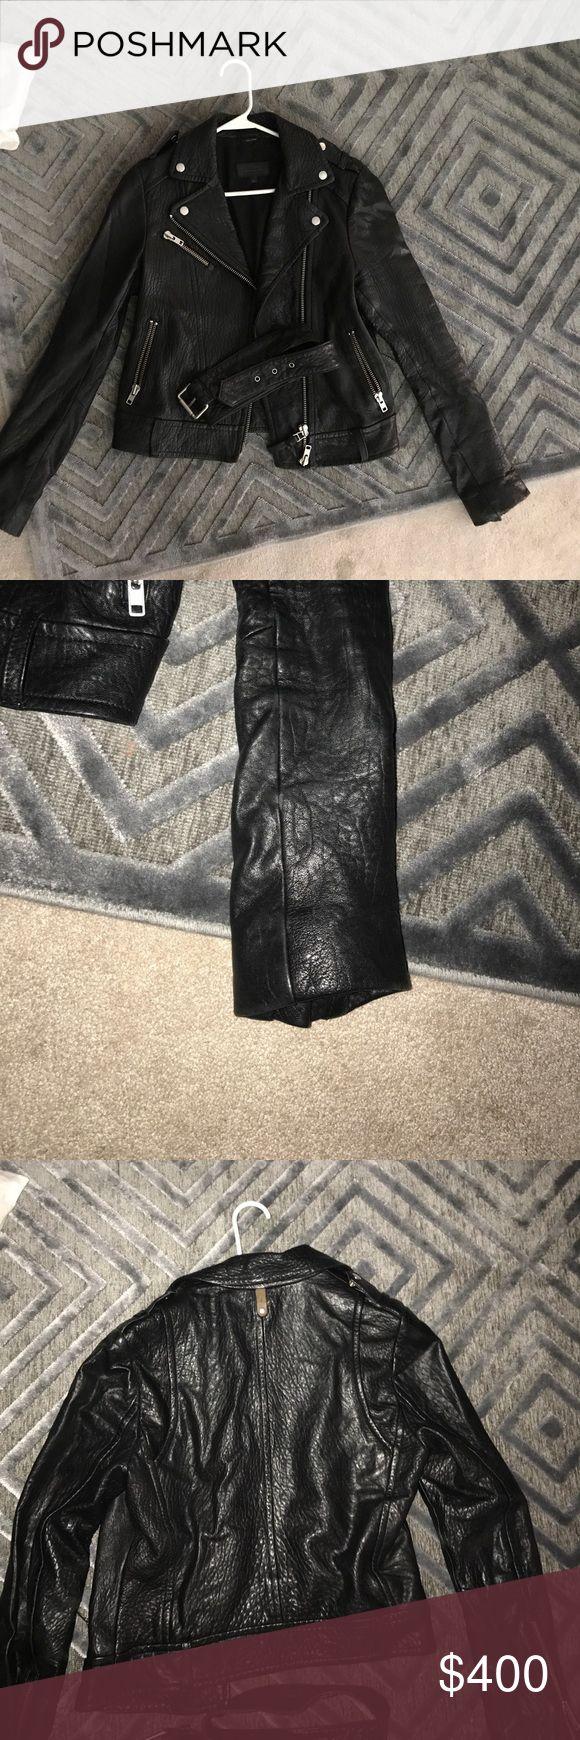 MACKAGE WOMENS LEATHER JACKET SMALL MACKAGE Womens Leather jacket SMALL GOES PERFECT WITH ANYTHING Mackage Jackets & Coats Utility Jackets